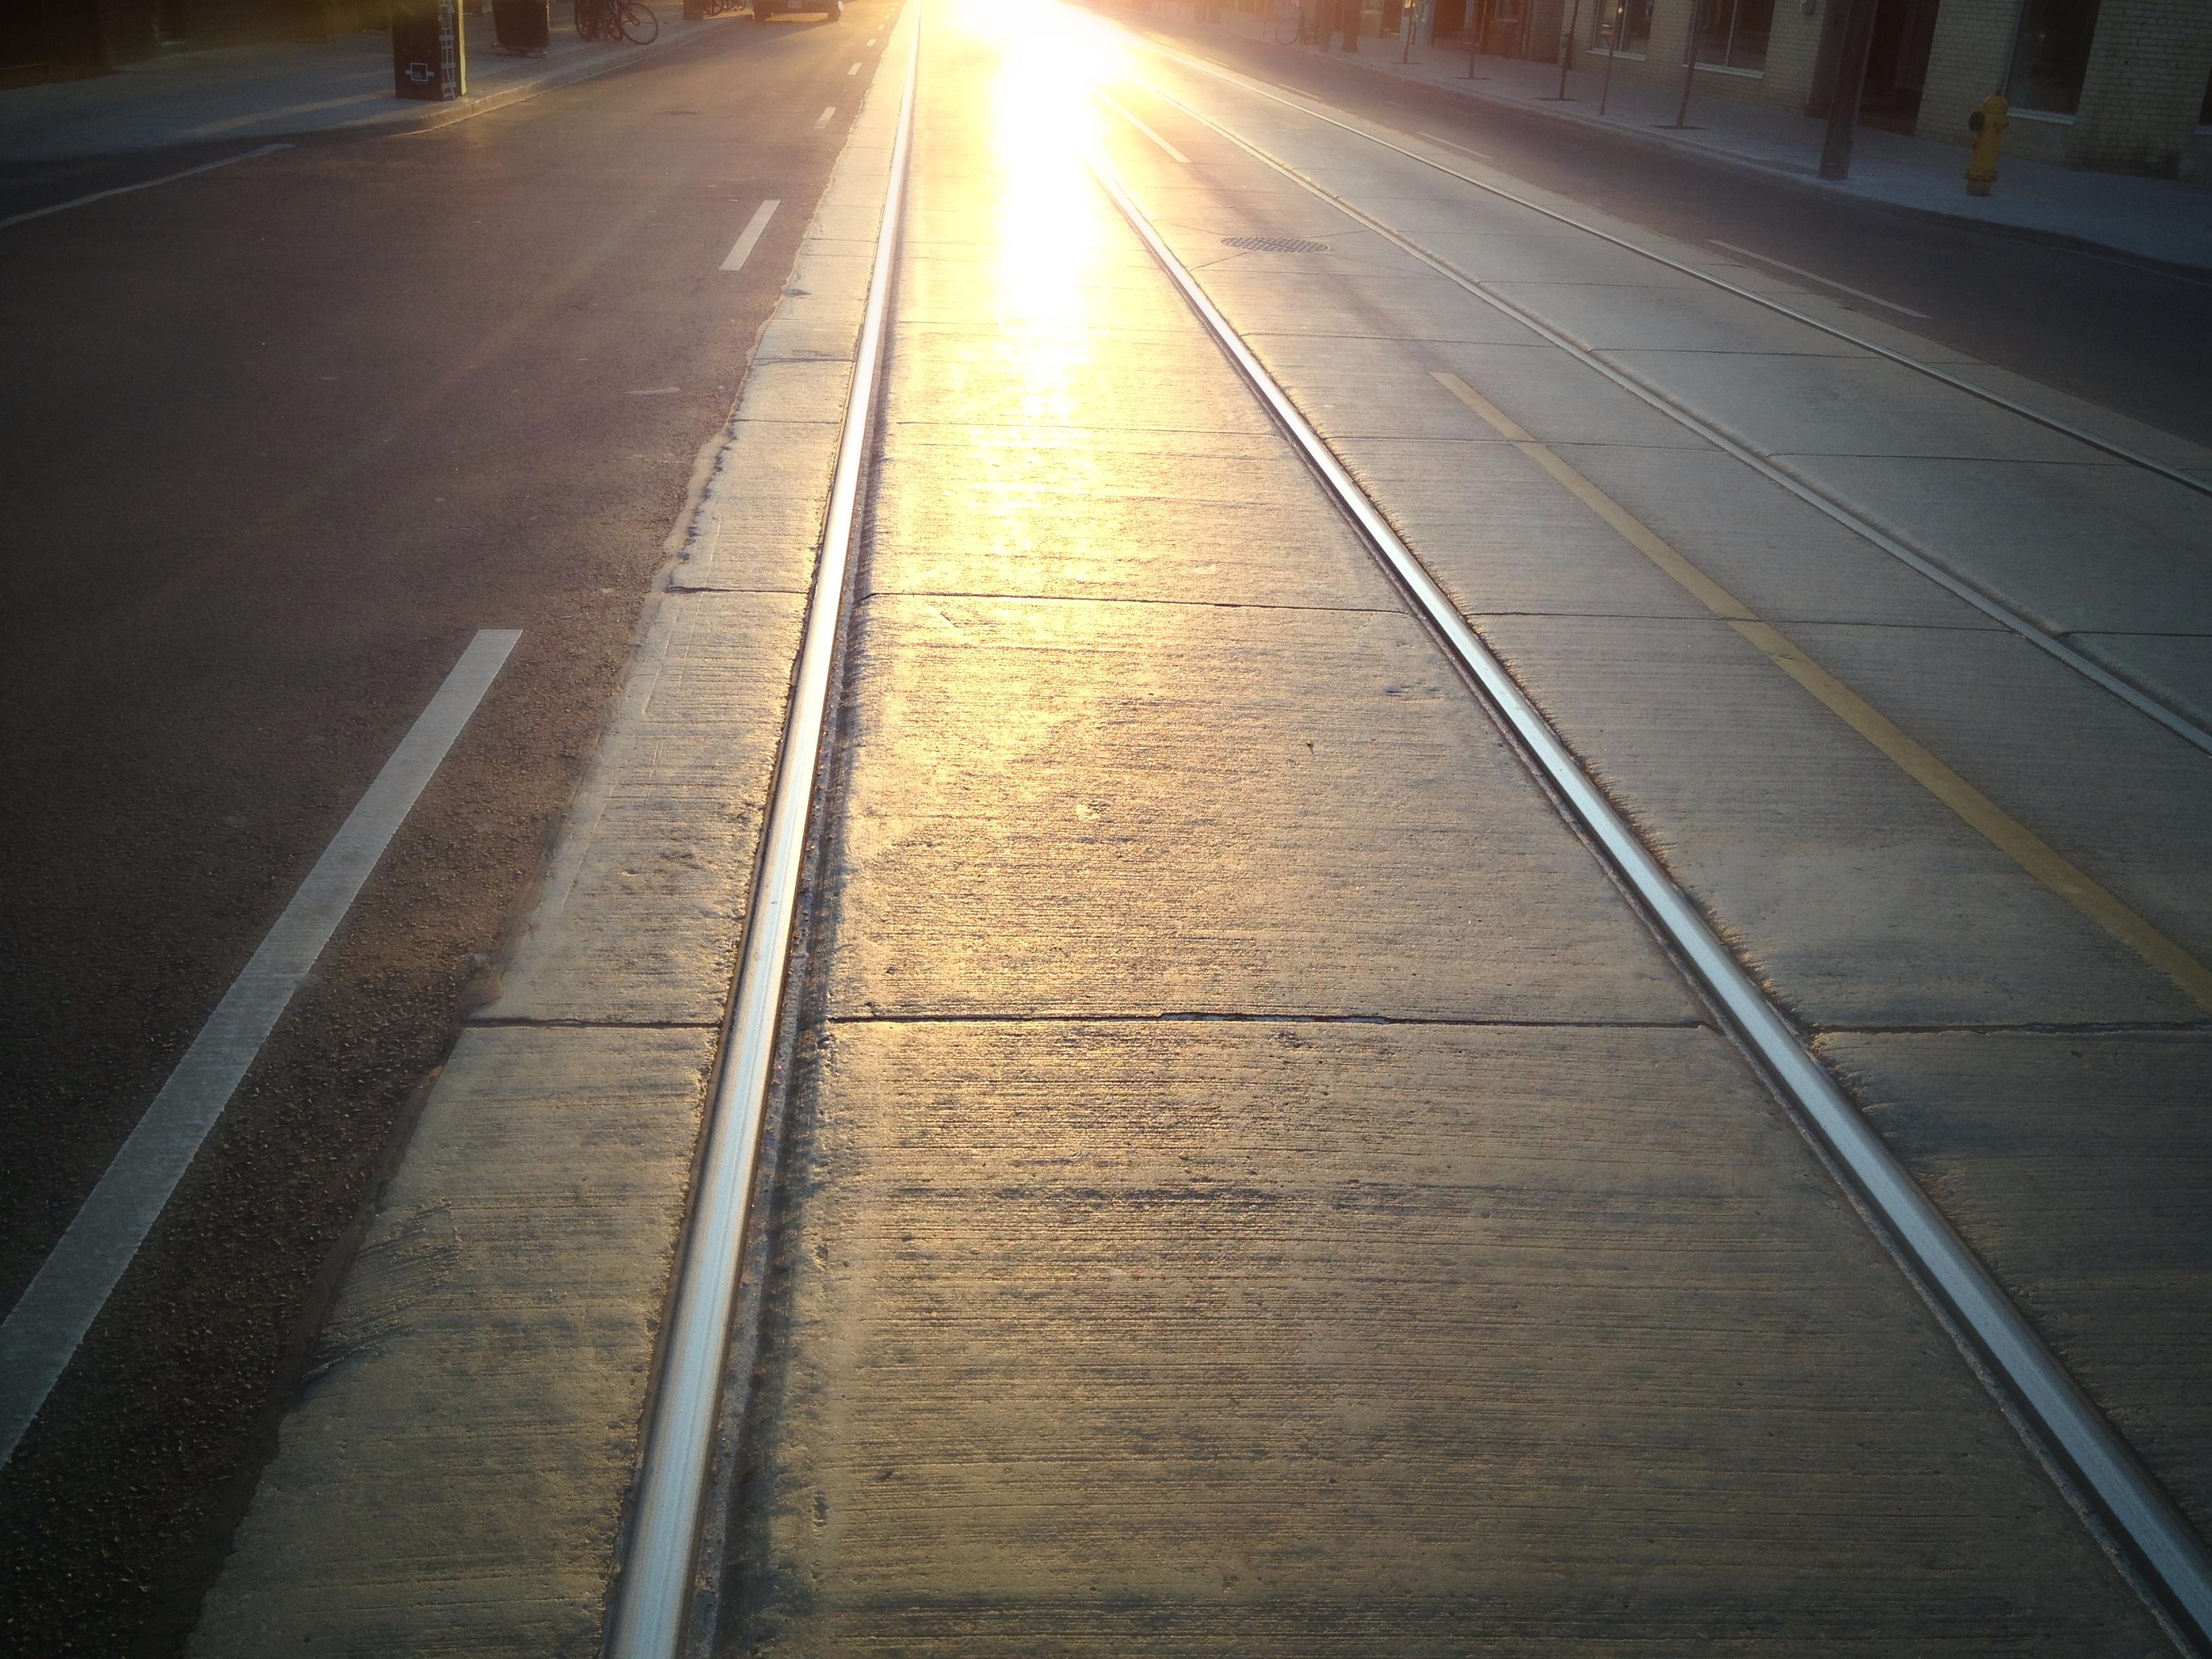 Streetcar track light